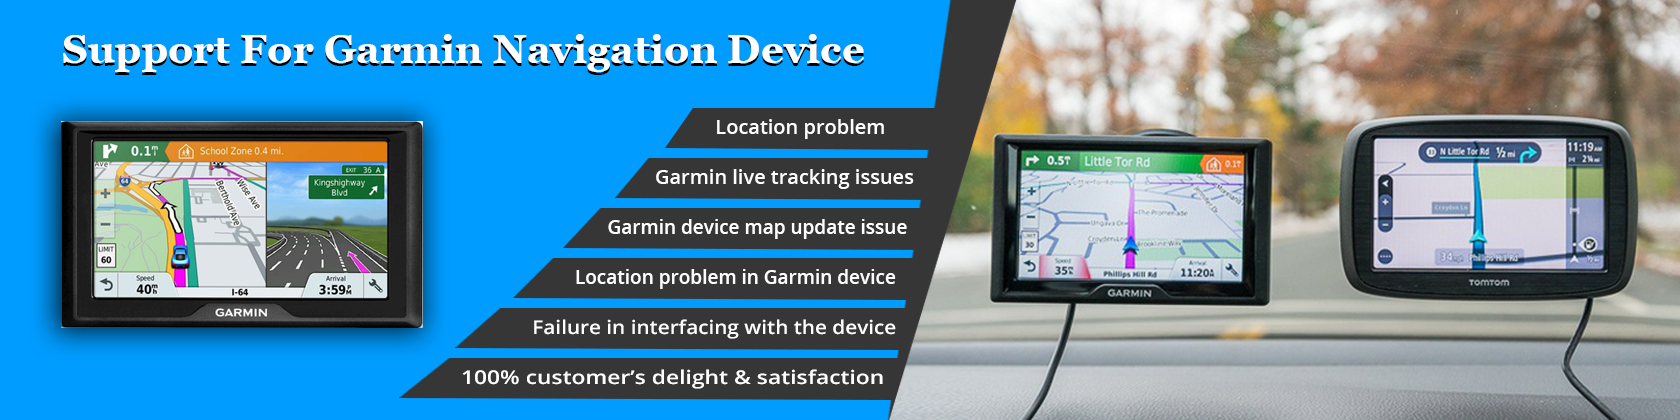 Garmin Navigation -banners